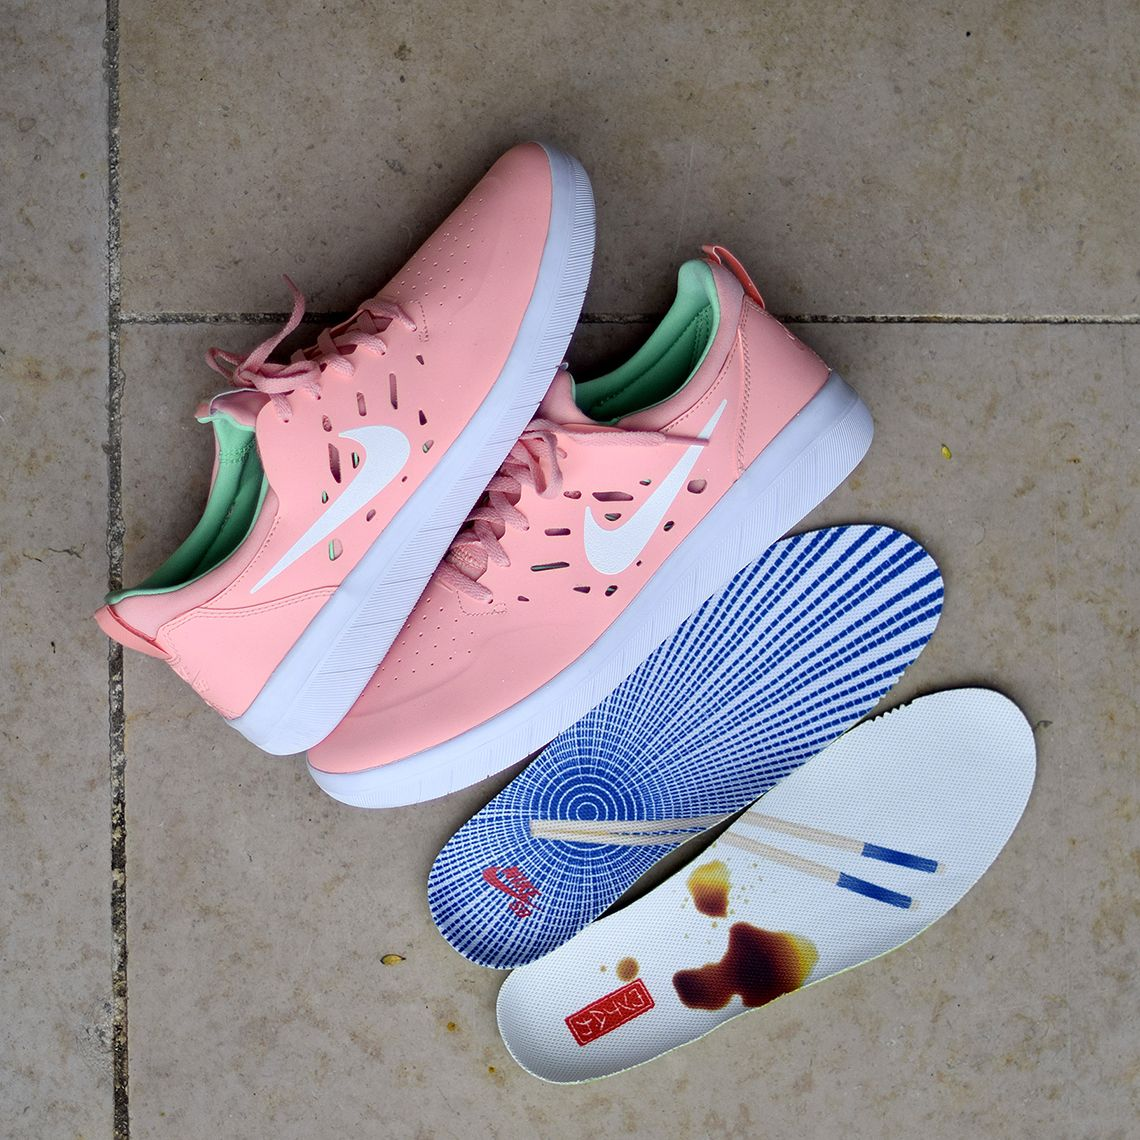 robo Evaluación girar  Nike SB Nyjah Free Sushi Release Info   SneakerNews.com   Nike sb, New nike  shoes, Nike